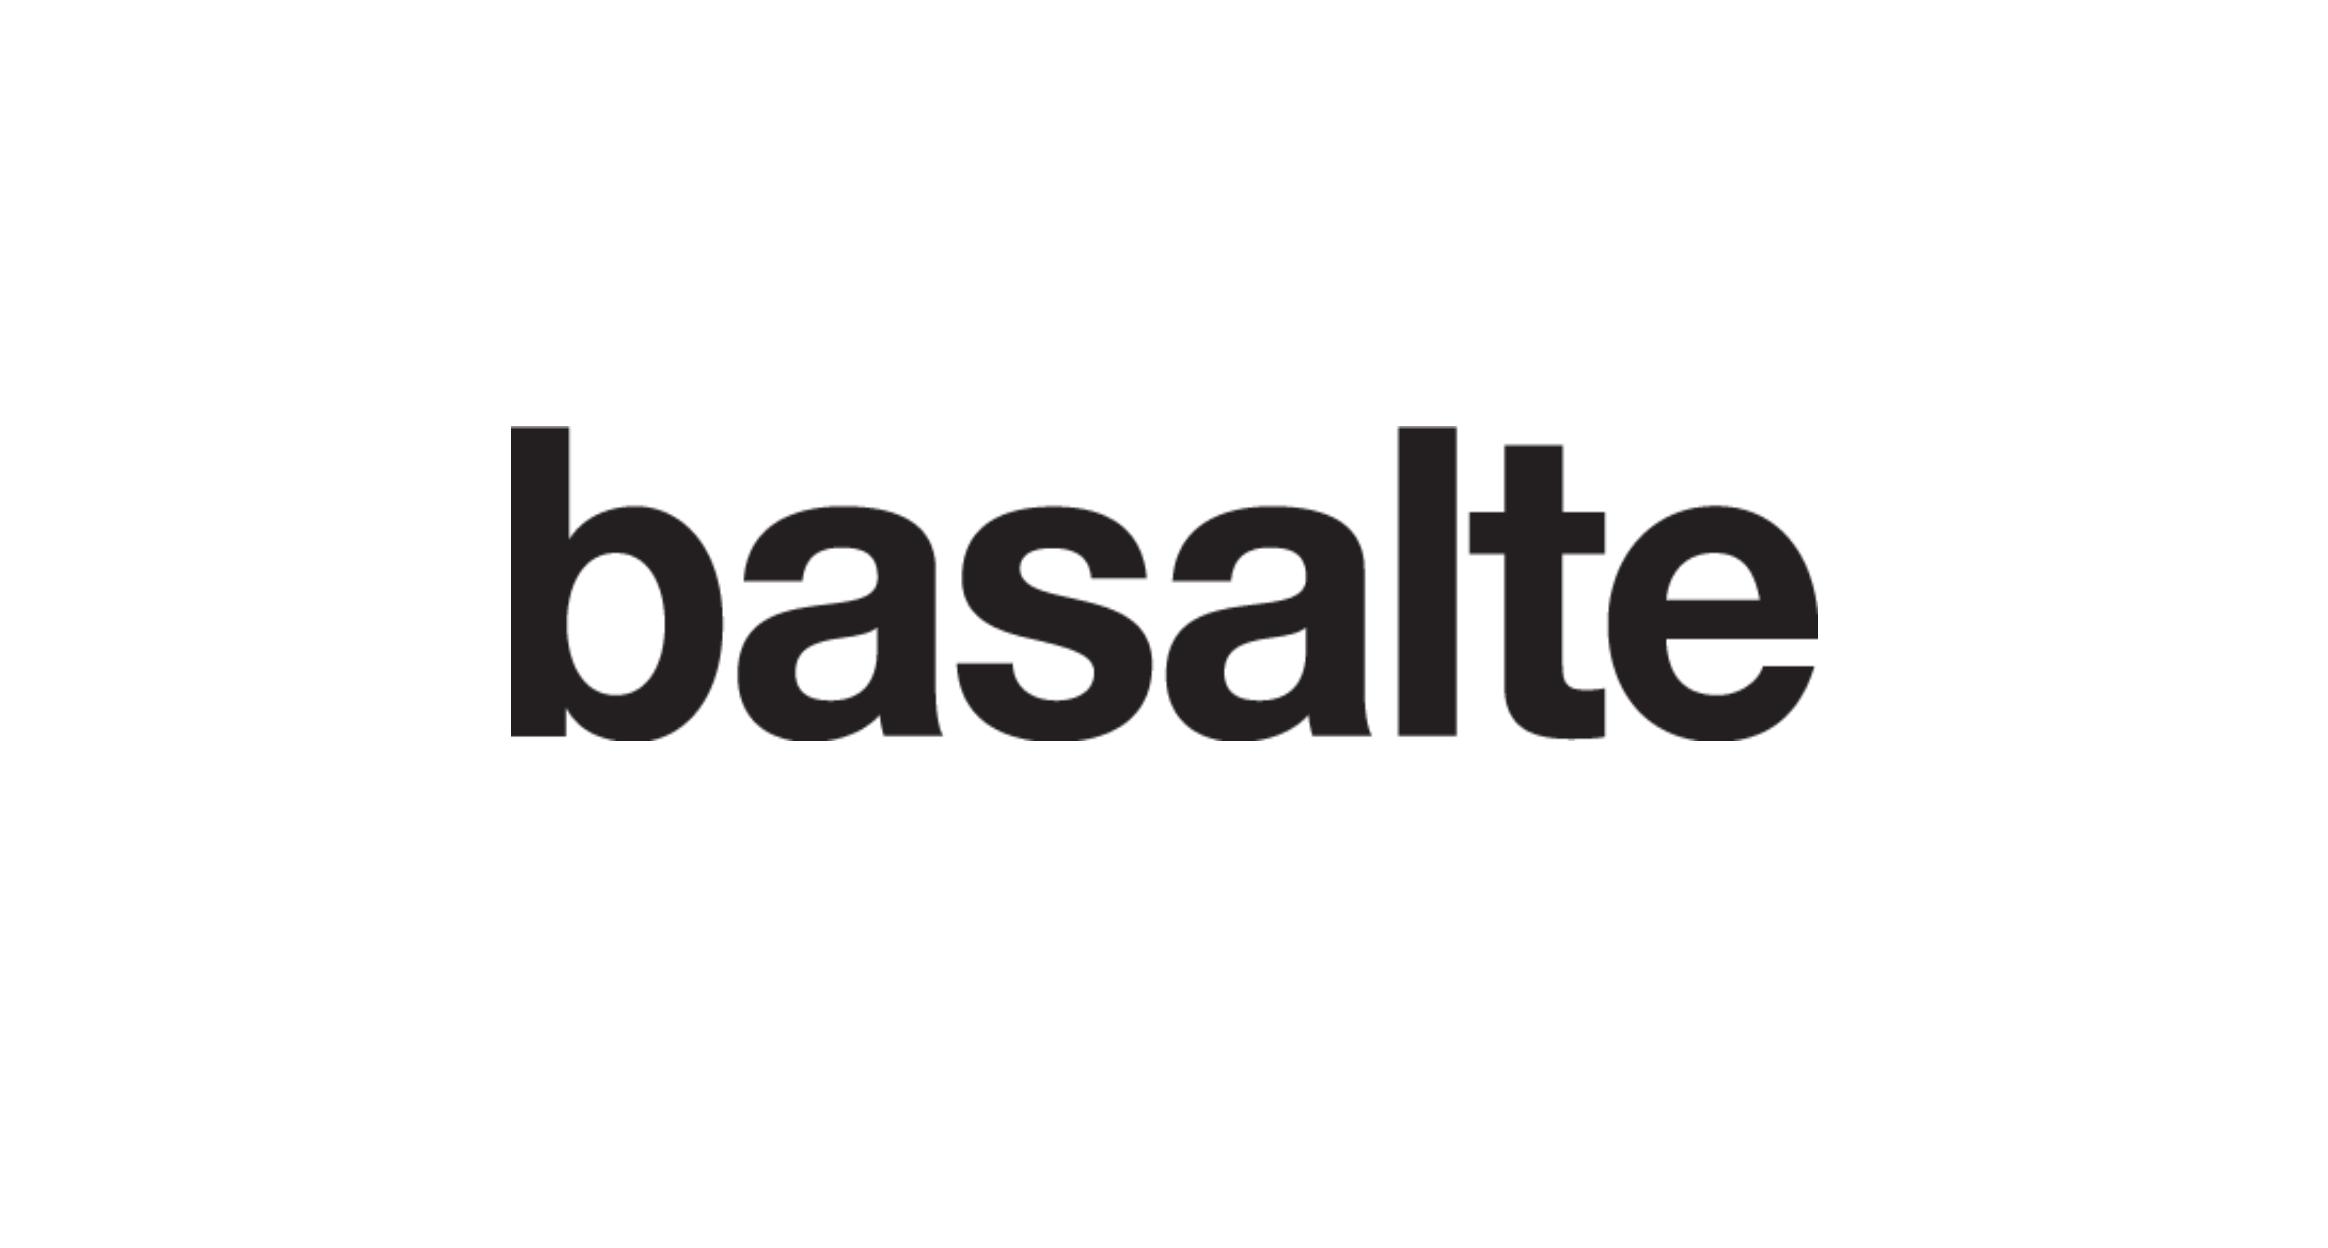 basalte.png